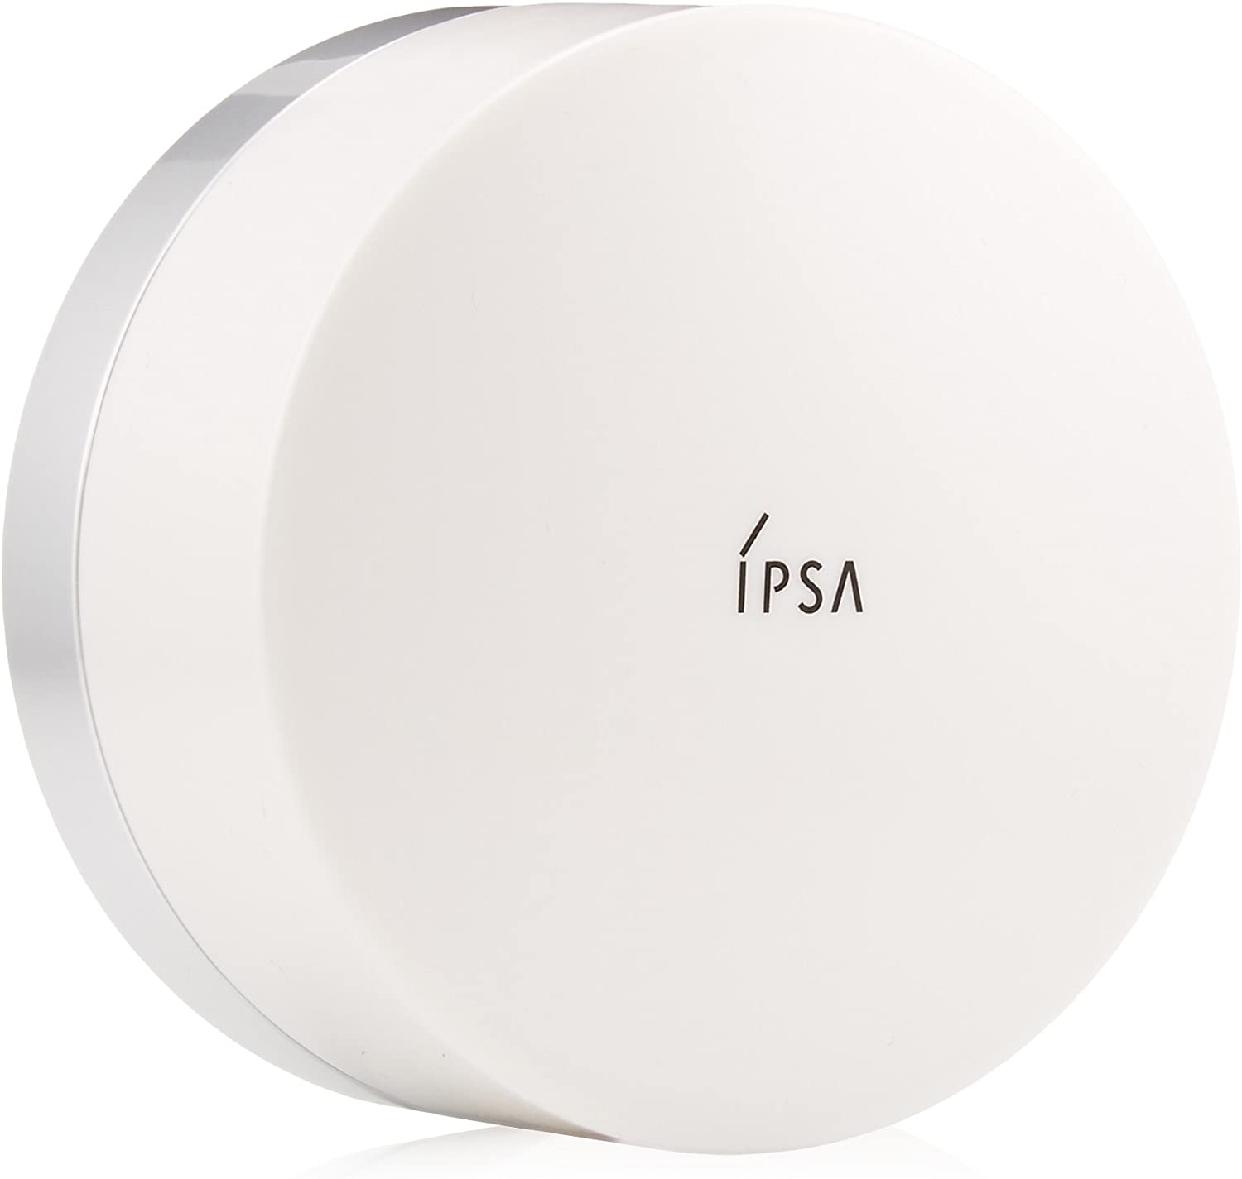 IPSA(イプサ)ピュアルースパウダー EX 1の商品画像